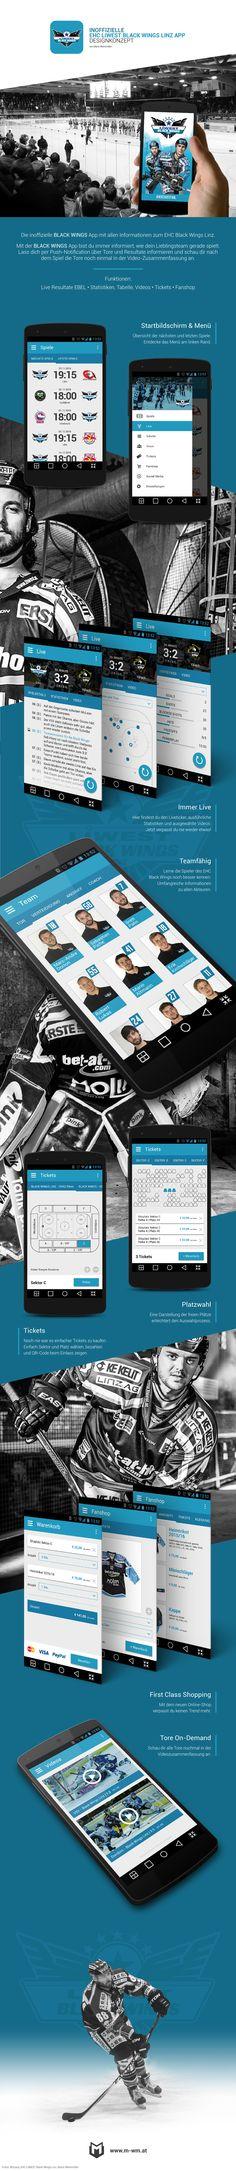 Die inoffizielle BLACK WINGS App mit allen Informationen zum EHC Black Wings Linz.